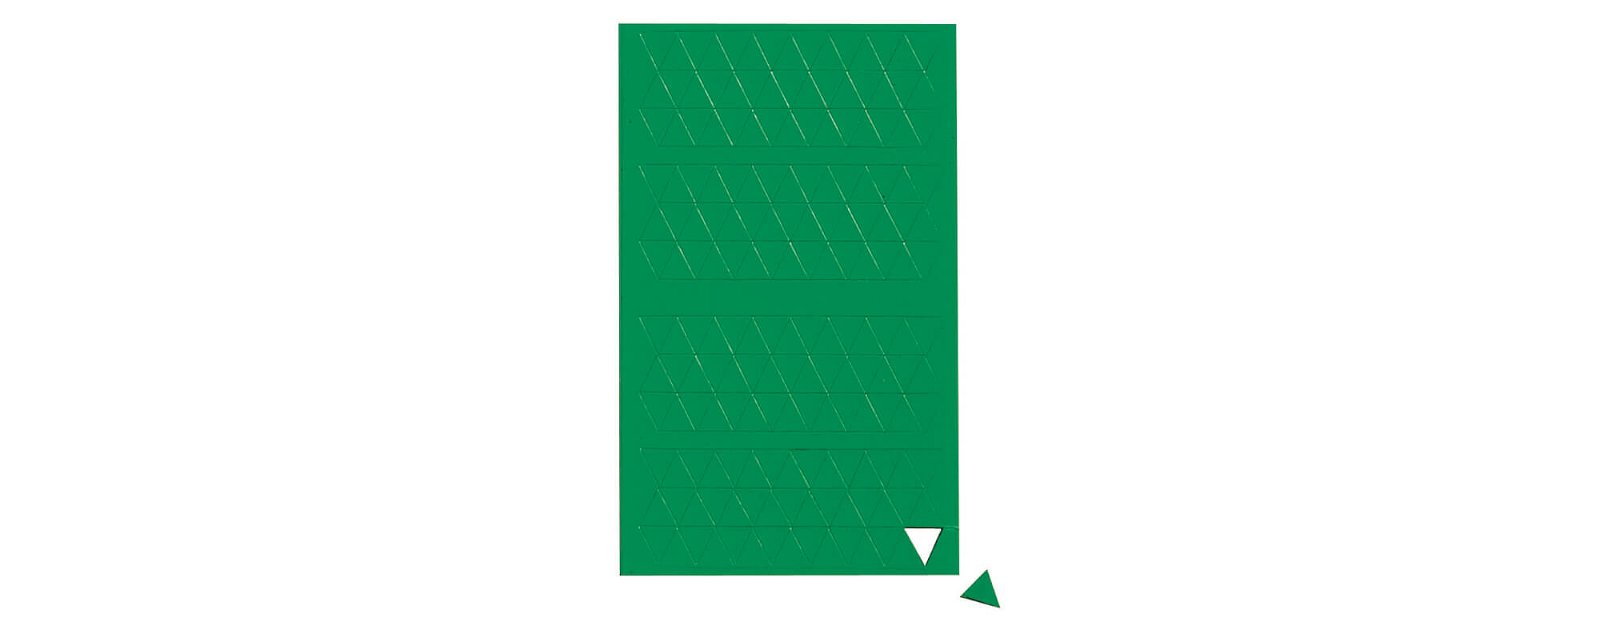 Magnetsymbole Dreieck,  180 St./Btl., grün